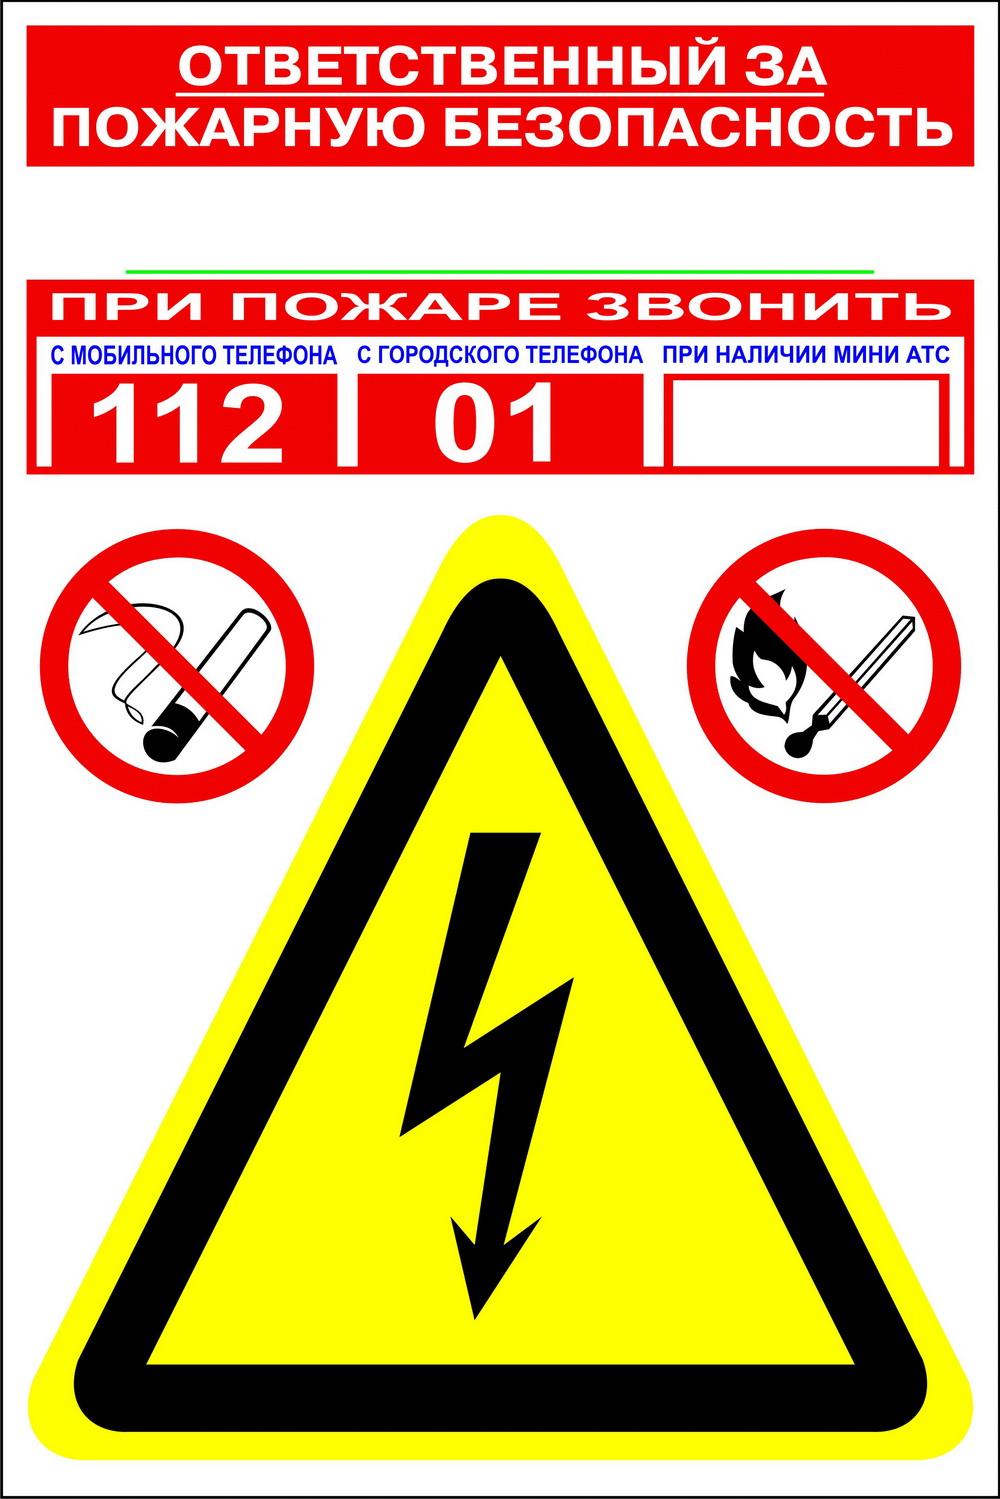 значки эвакуации: